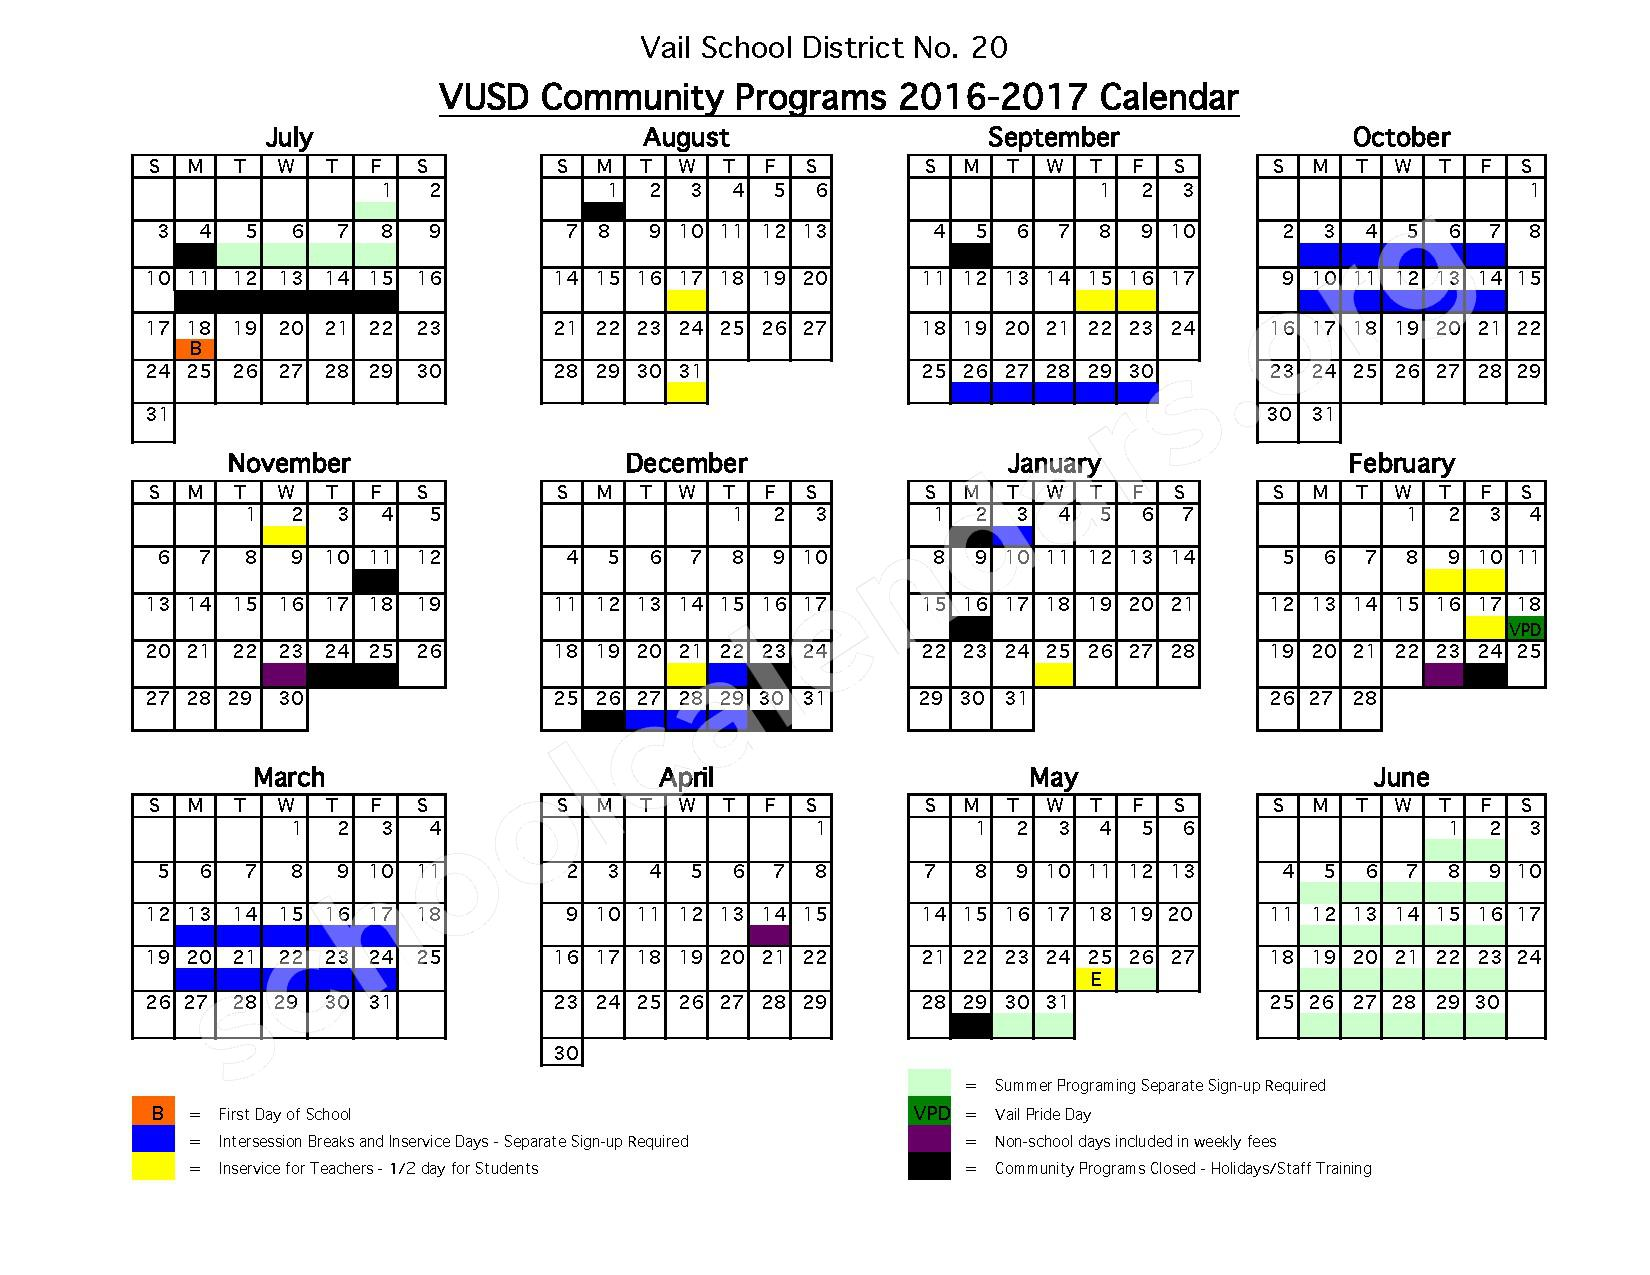 2016 - 2017 VUSD Community Programs Calendar – Vail School District – page 1